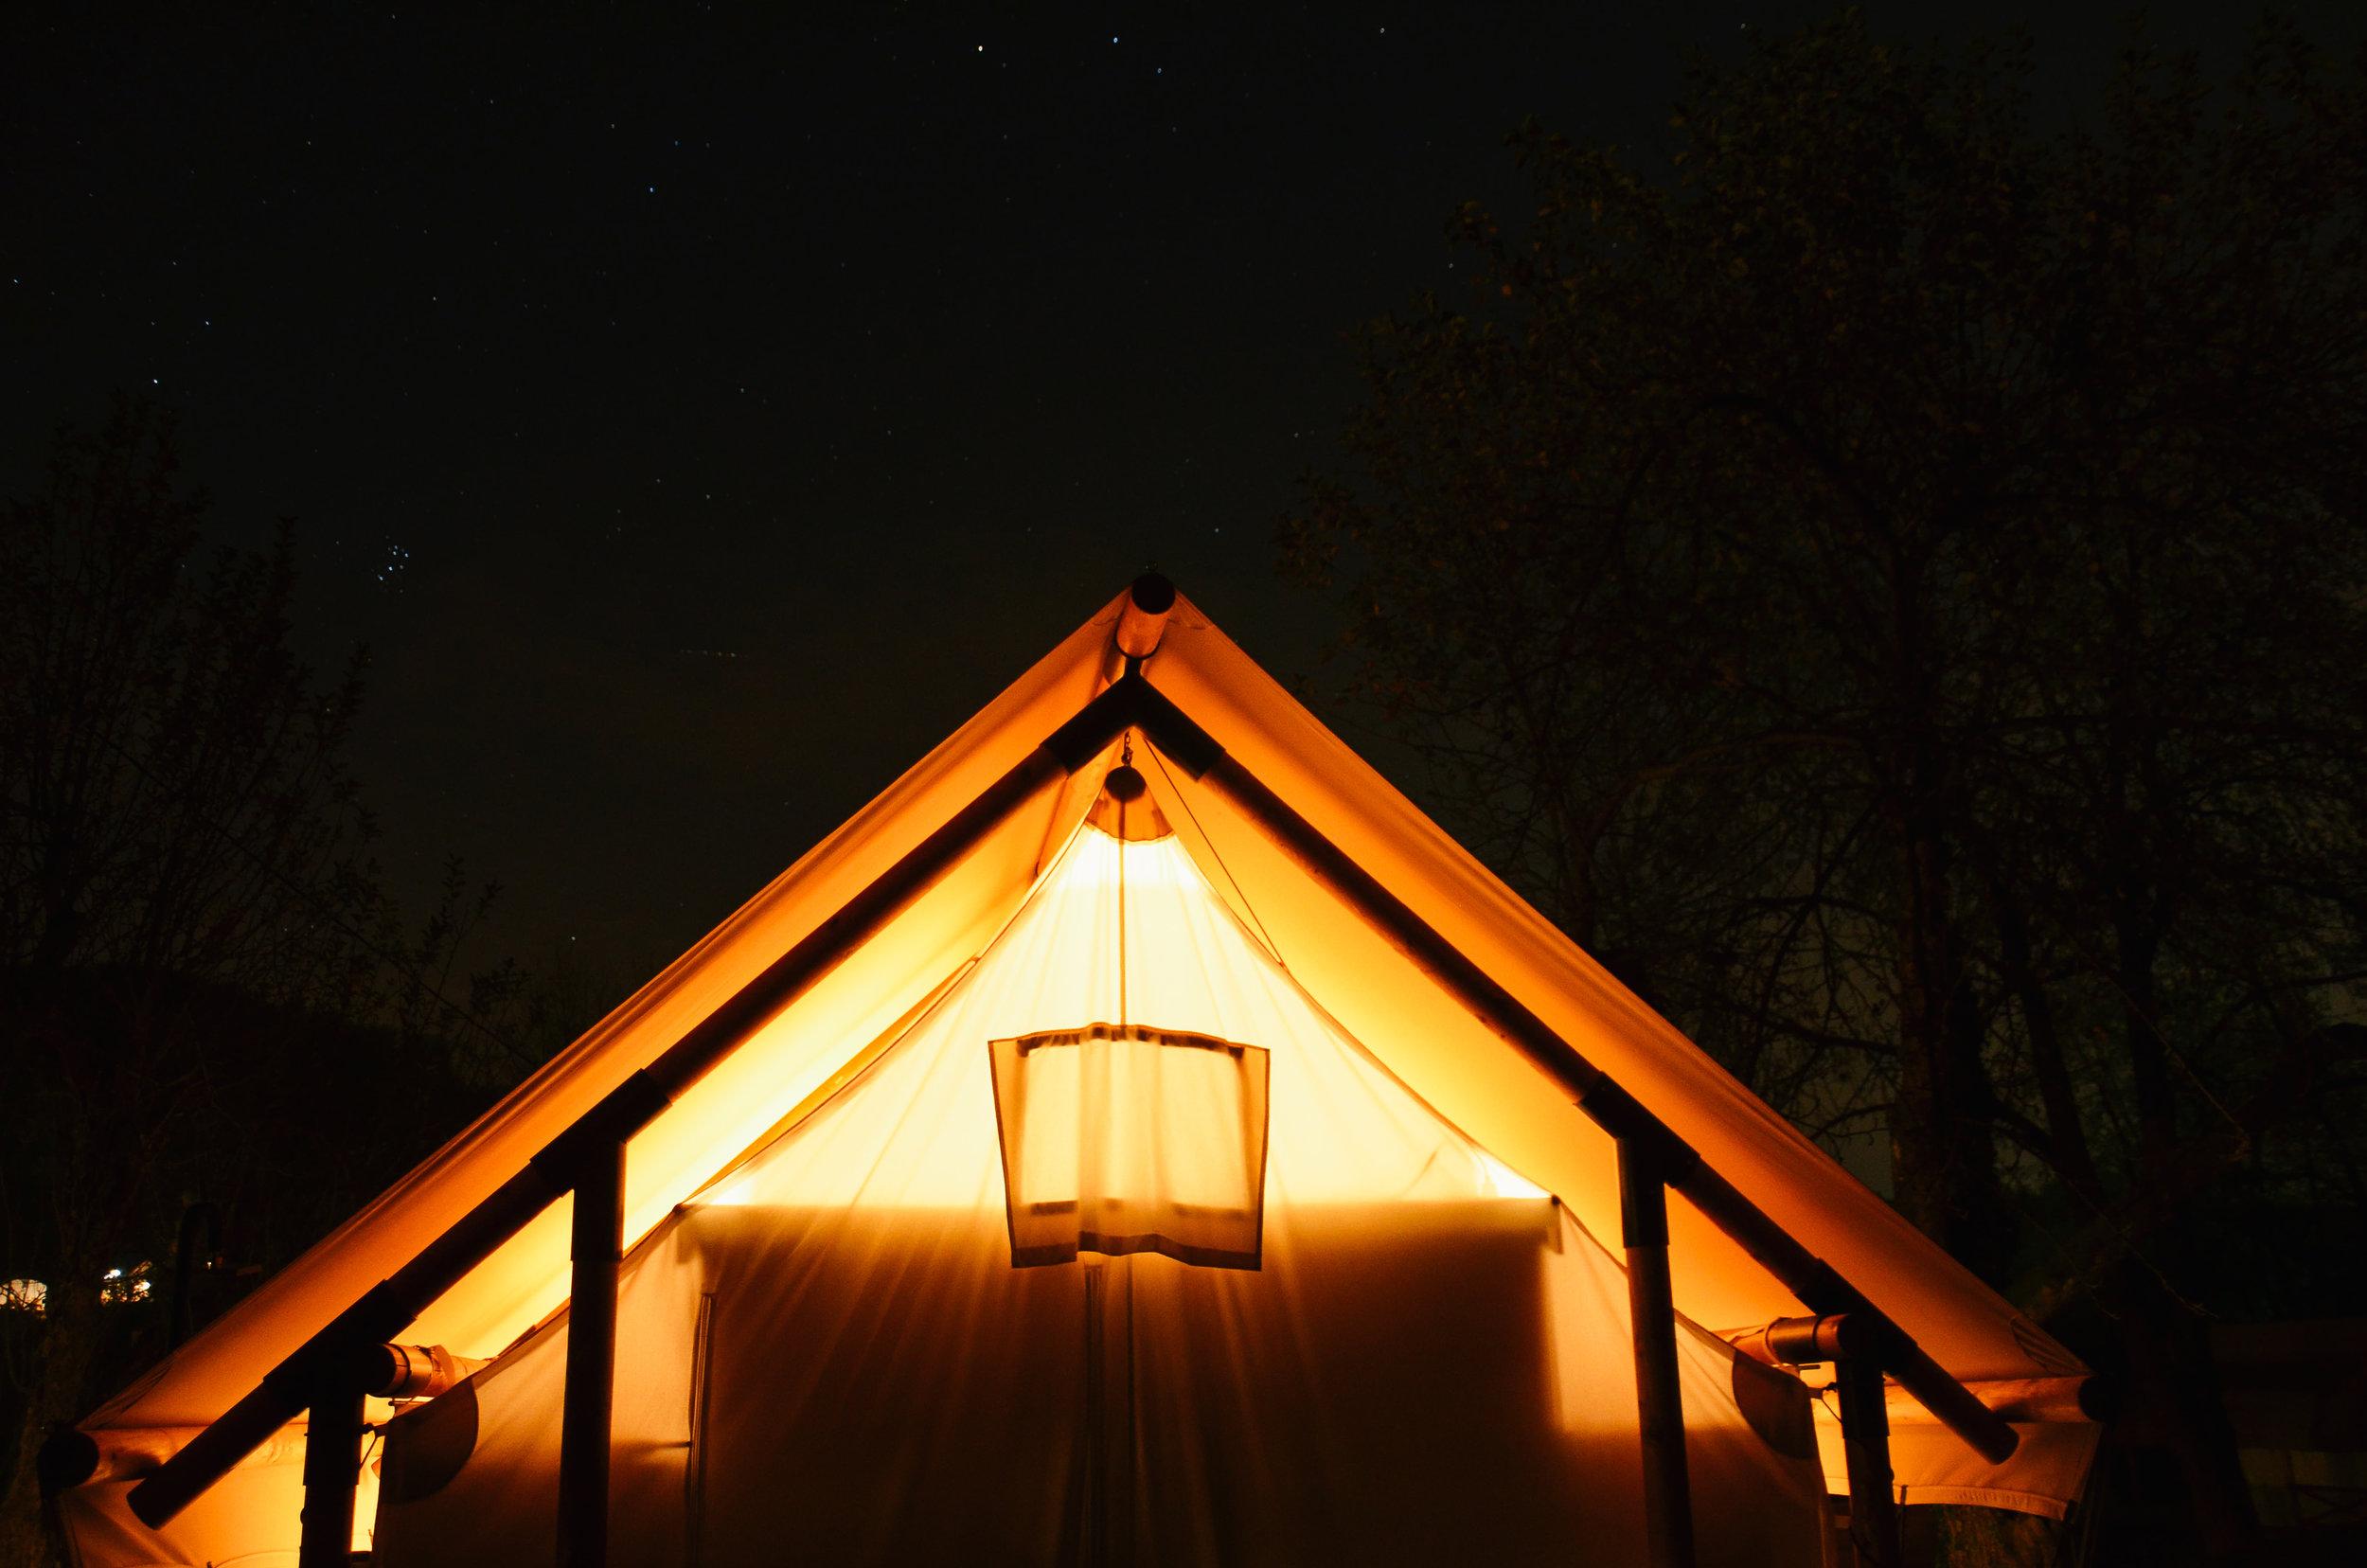 slovenia-travel-glamping-chateau-ramsak_DSC_2284.jpg